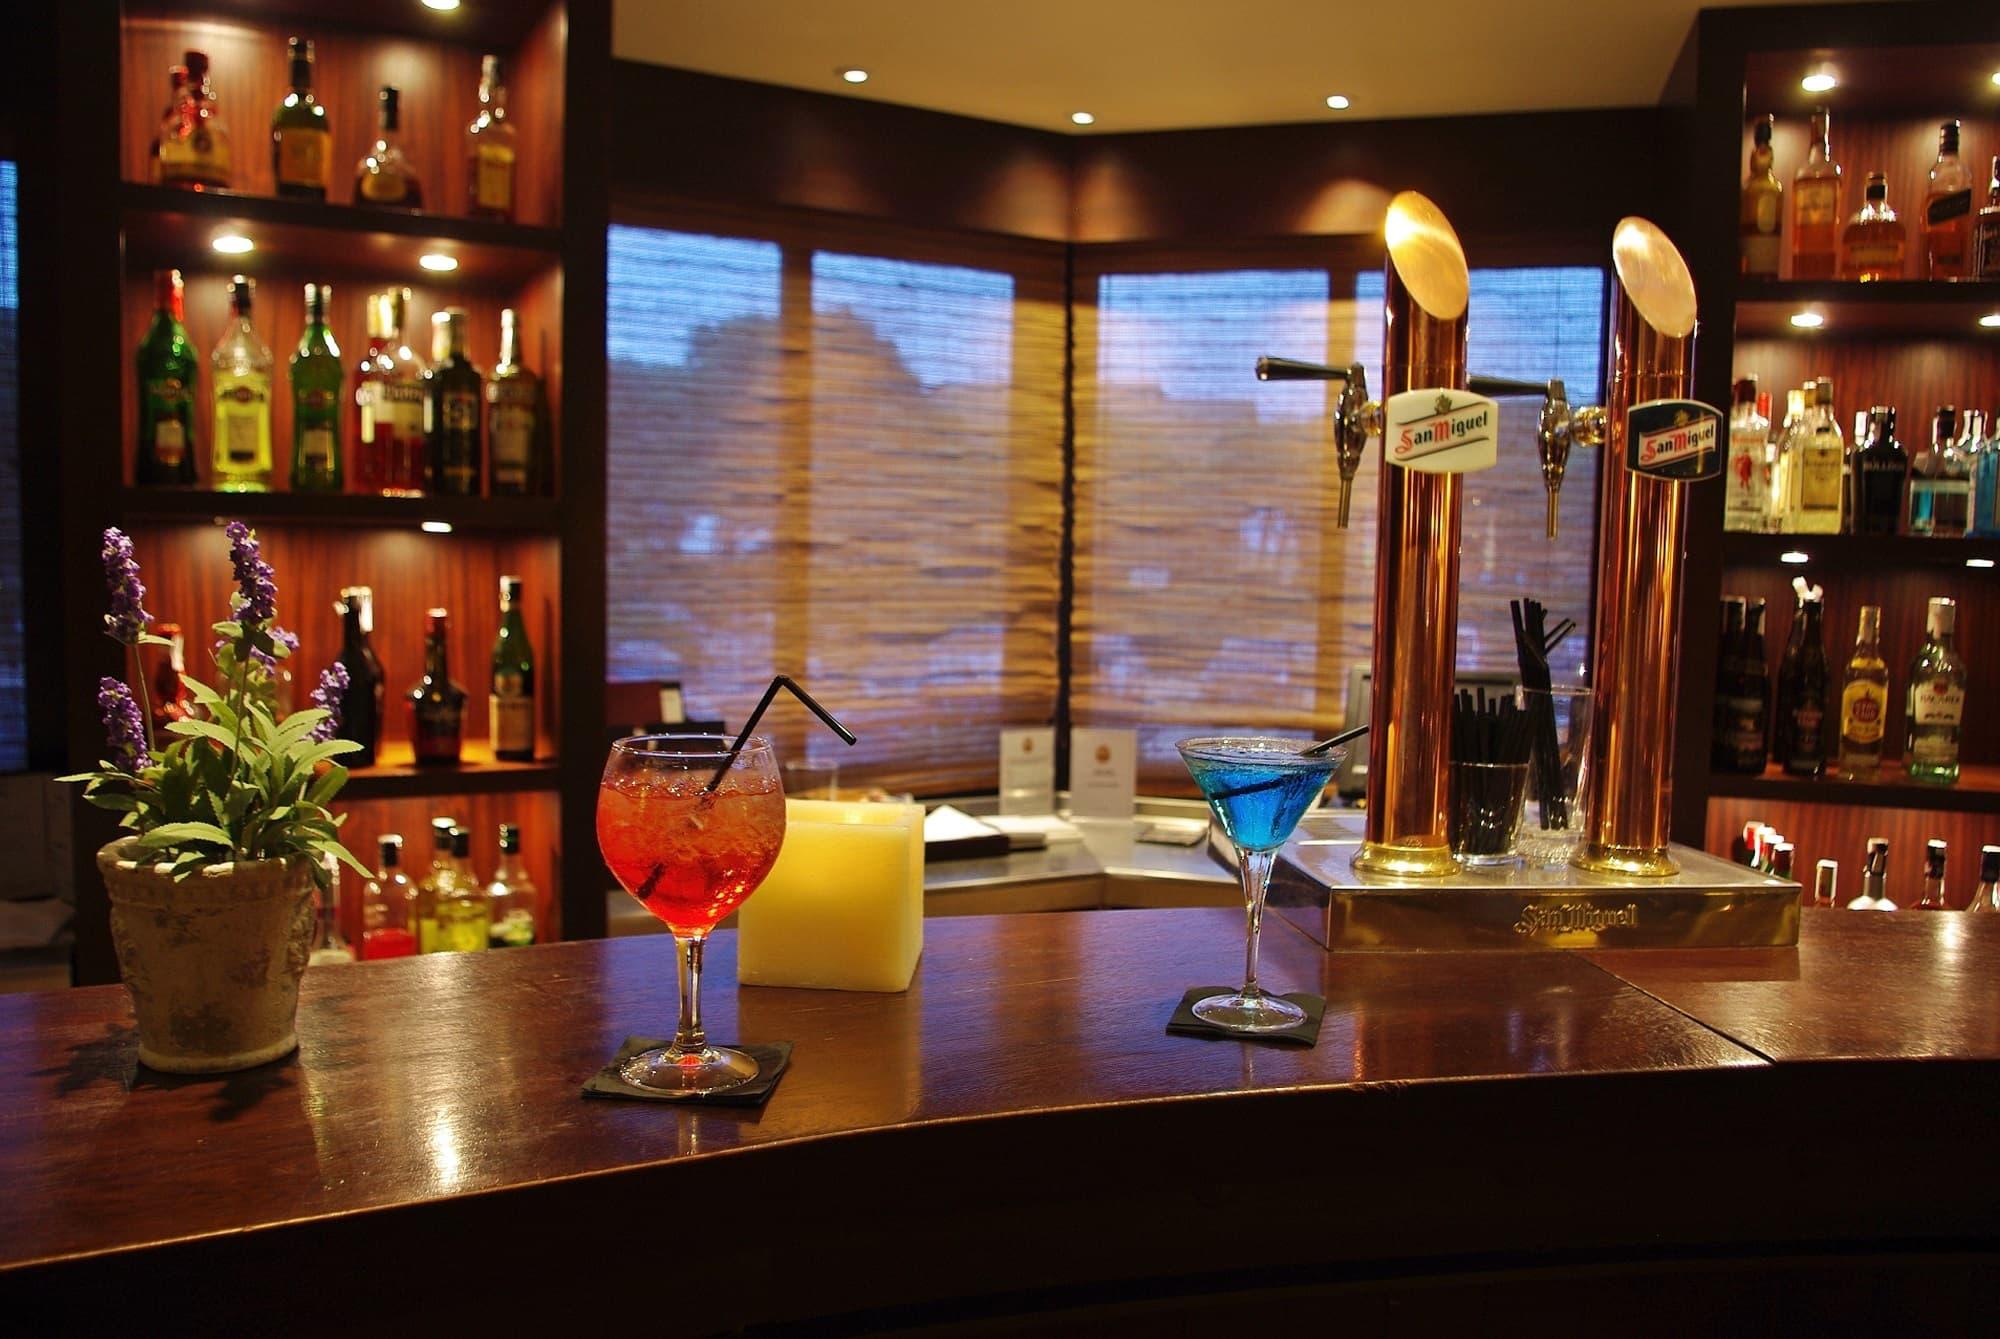 galeria/gastronomia/hlc_bar-havana_barra-cocktails.jpg